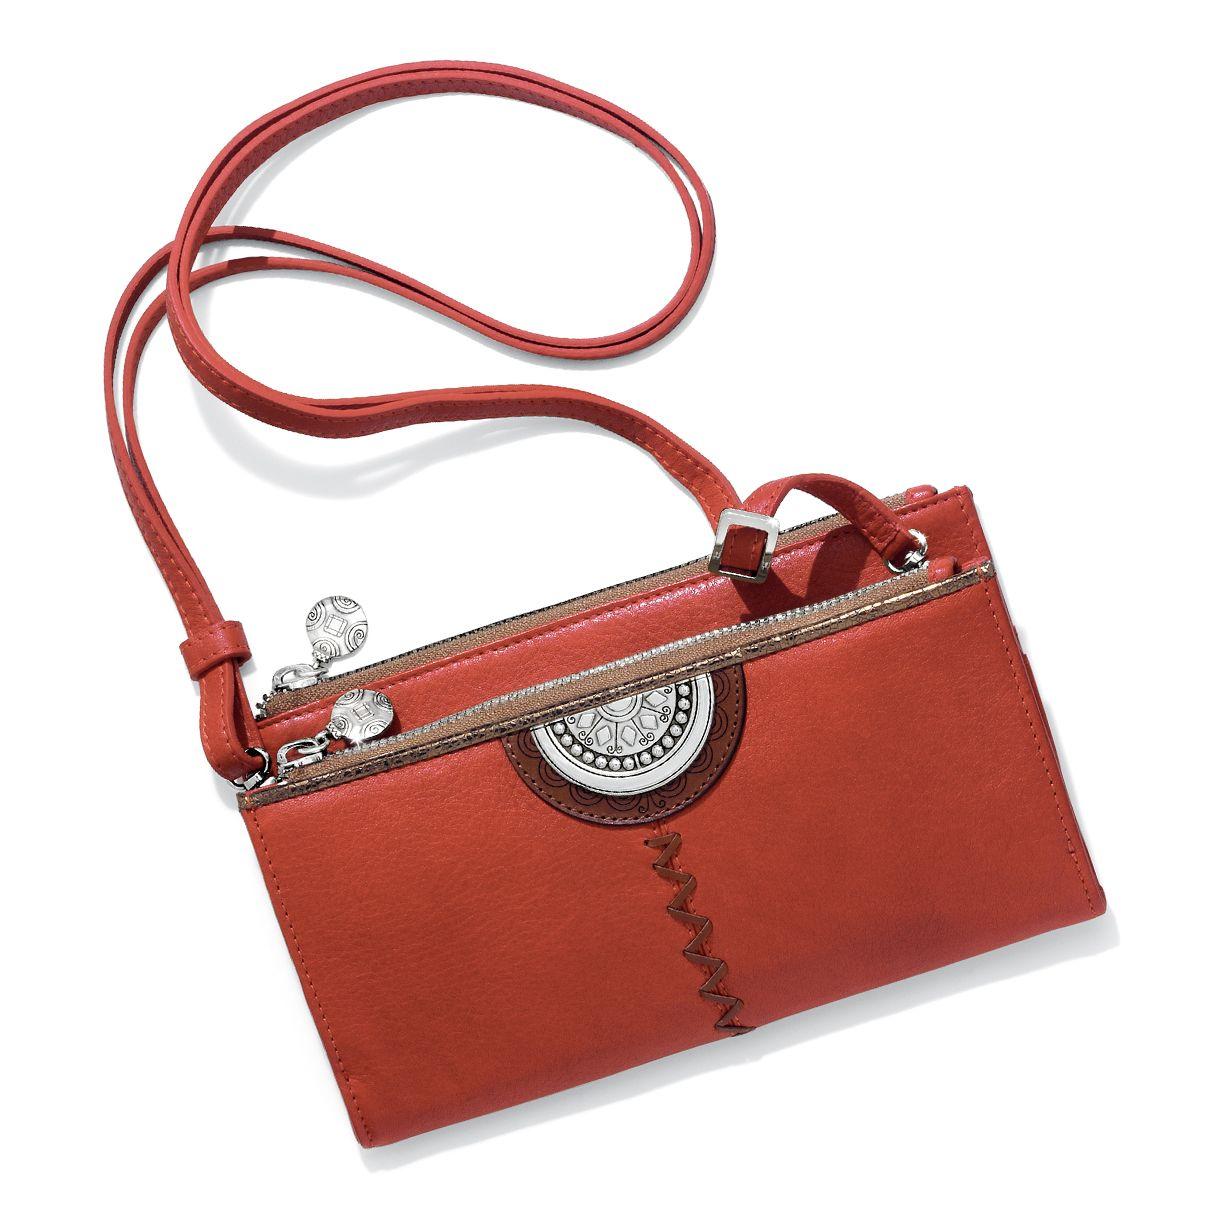 6292e5db09c Brighton Afrikanz organizer | Brighton in 2019 | Brighton handbags ...